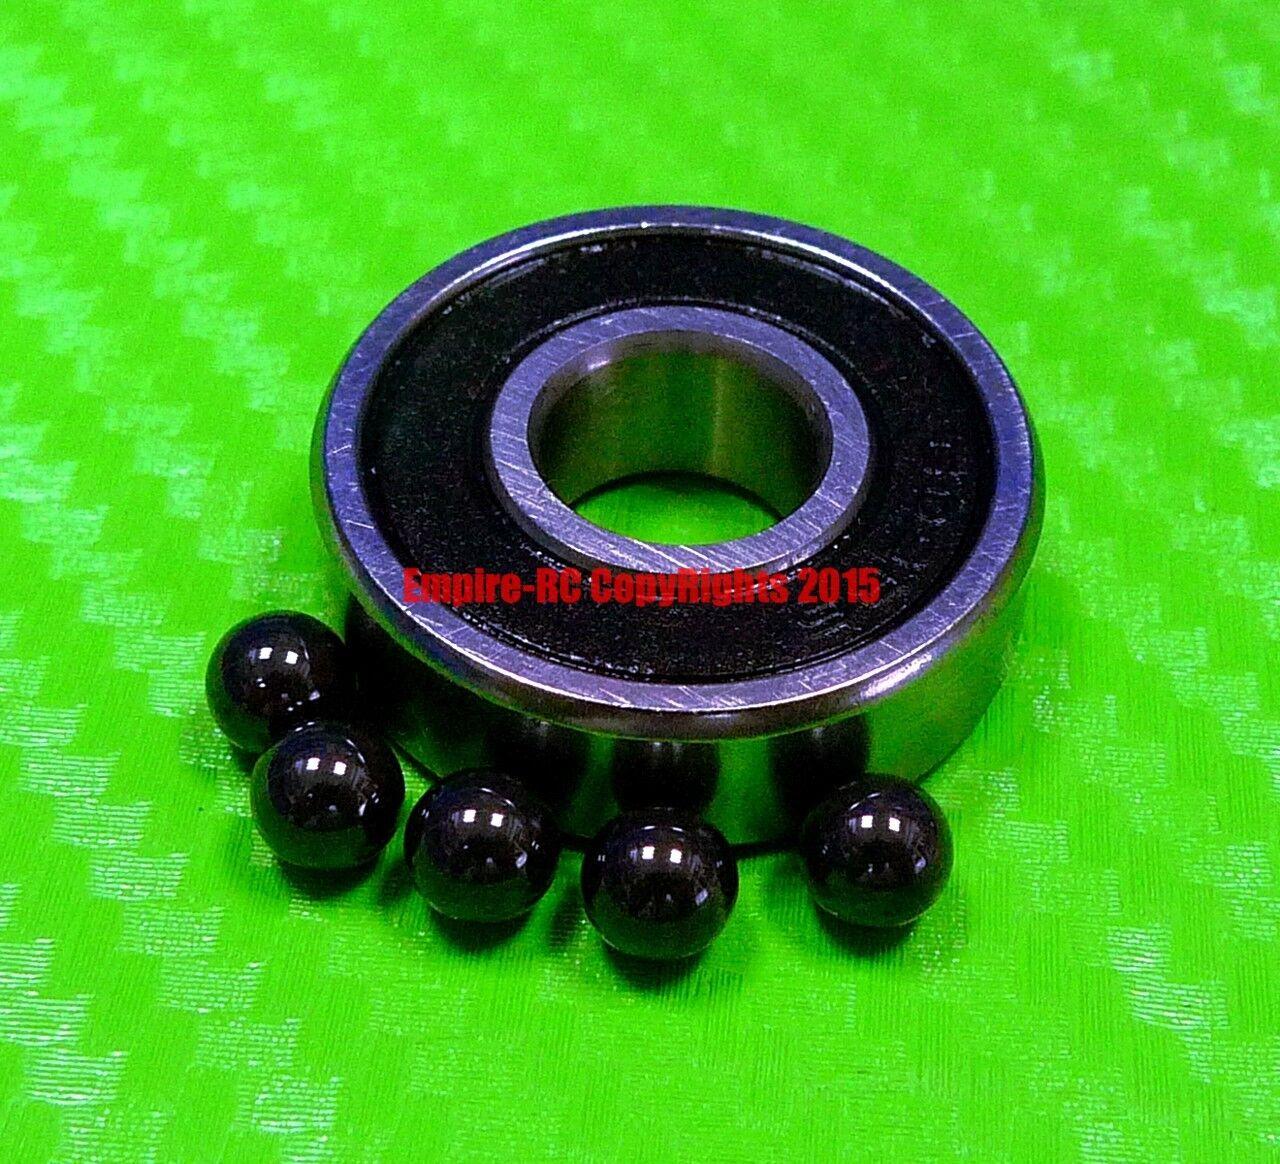 [QTY 10] (9x26x8 mm) S629-2RS Stainless HYBRID CERAMIC Ball Bearing Bearings BLK